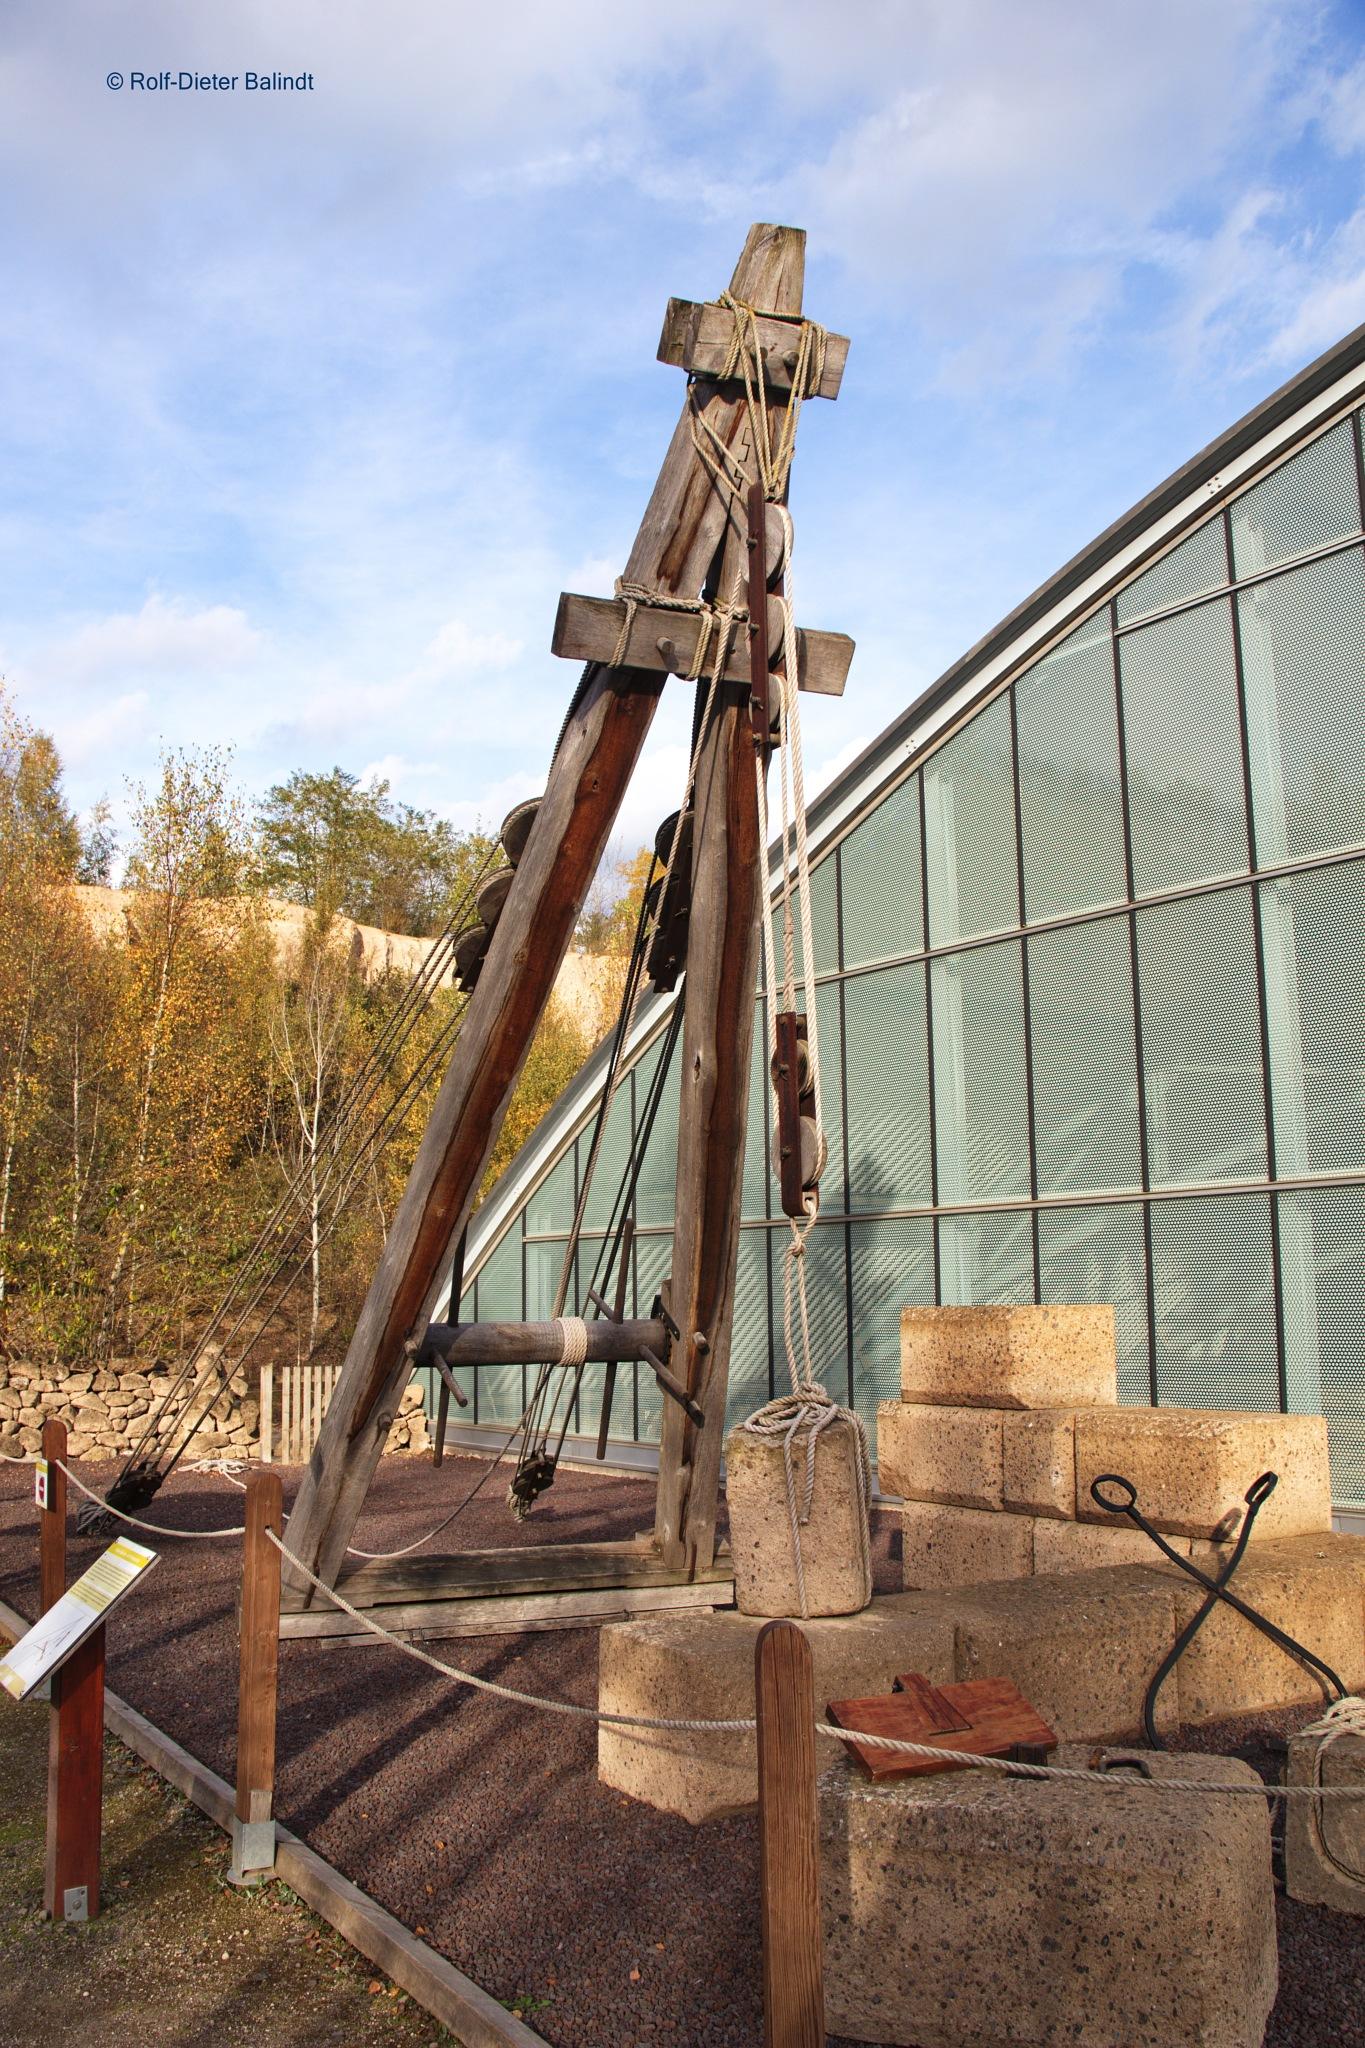 Bergwerk / mine by Rolf-Dieter Balindt